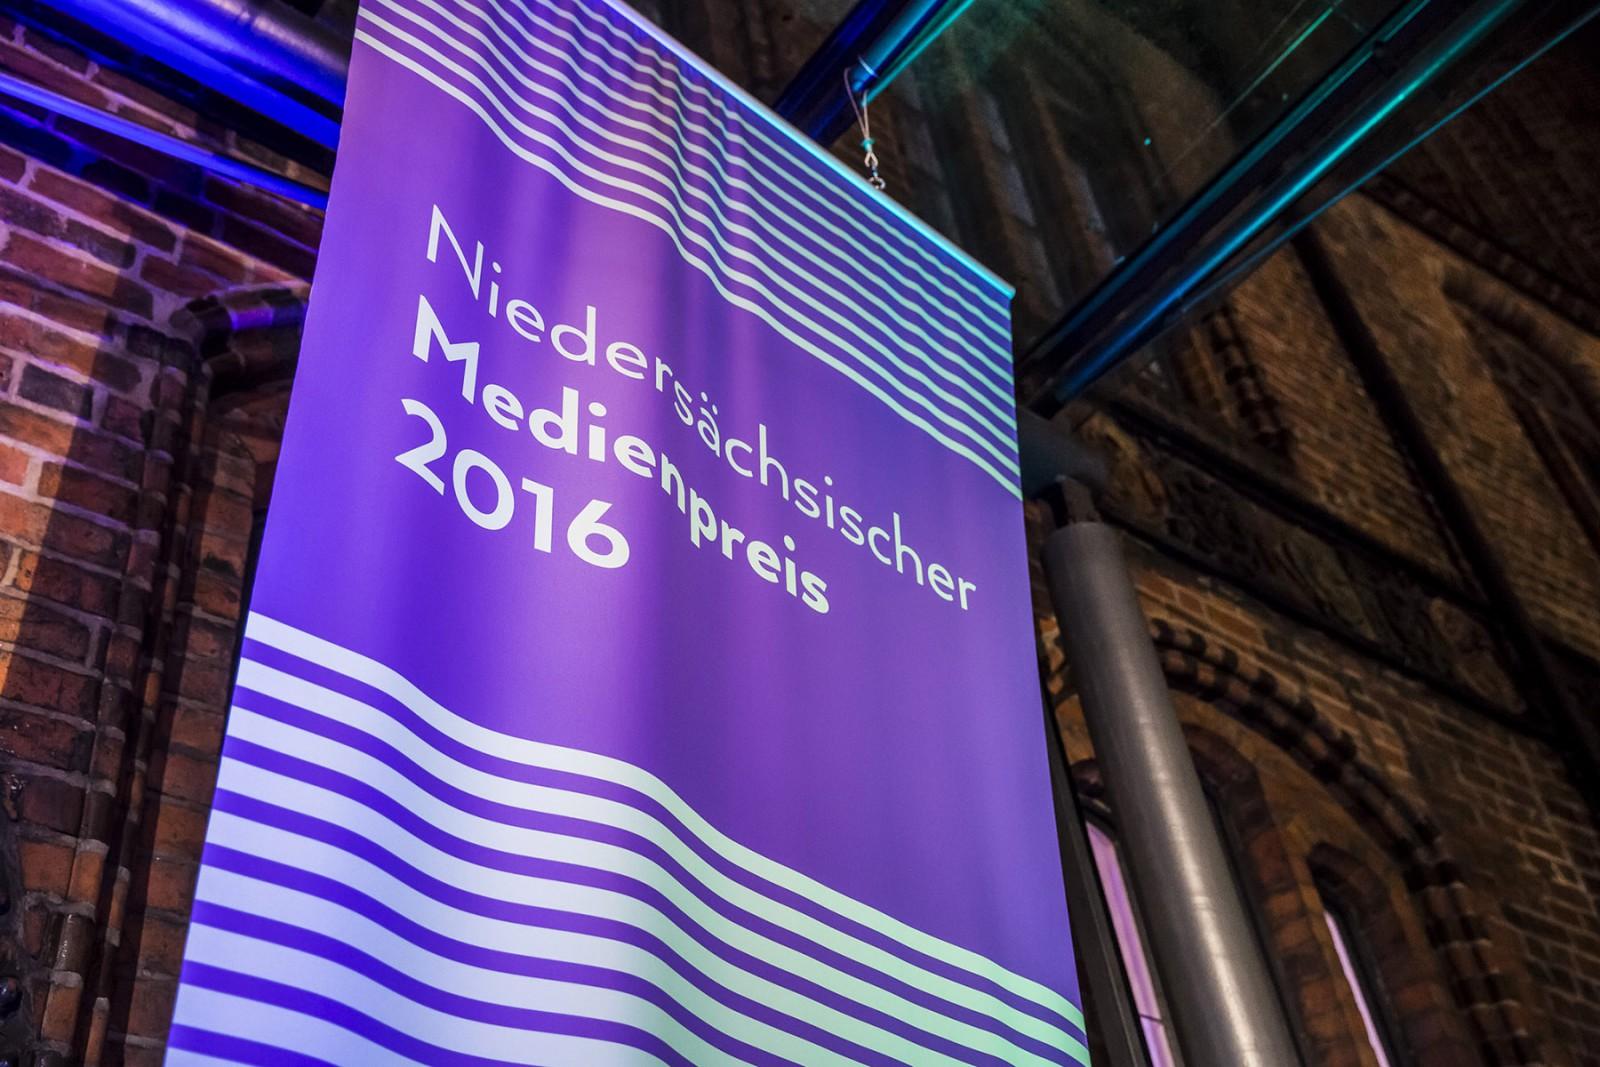 Niedersächsischer Medienpreis 2016 (Media Award of the State Media Authority of Lower Saxony)